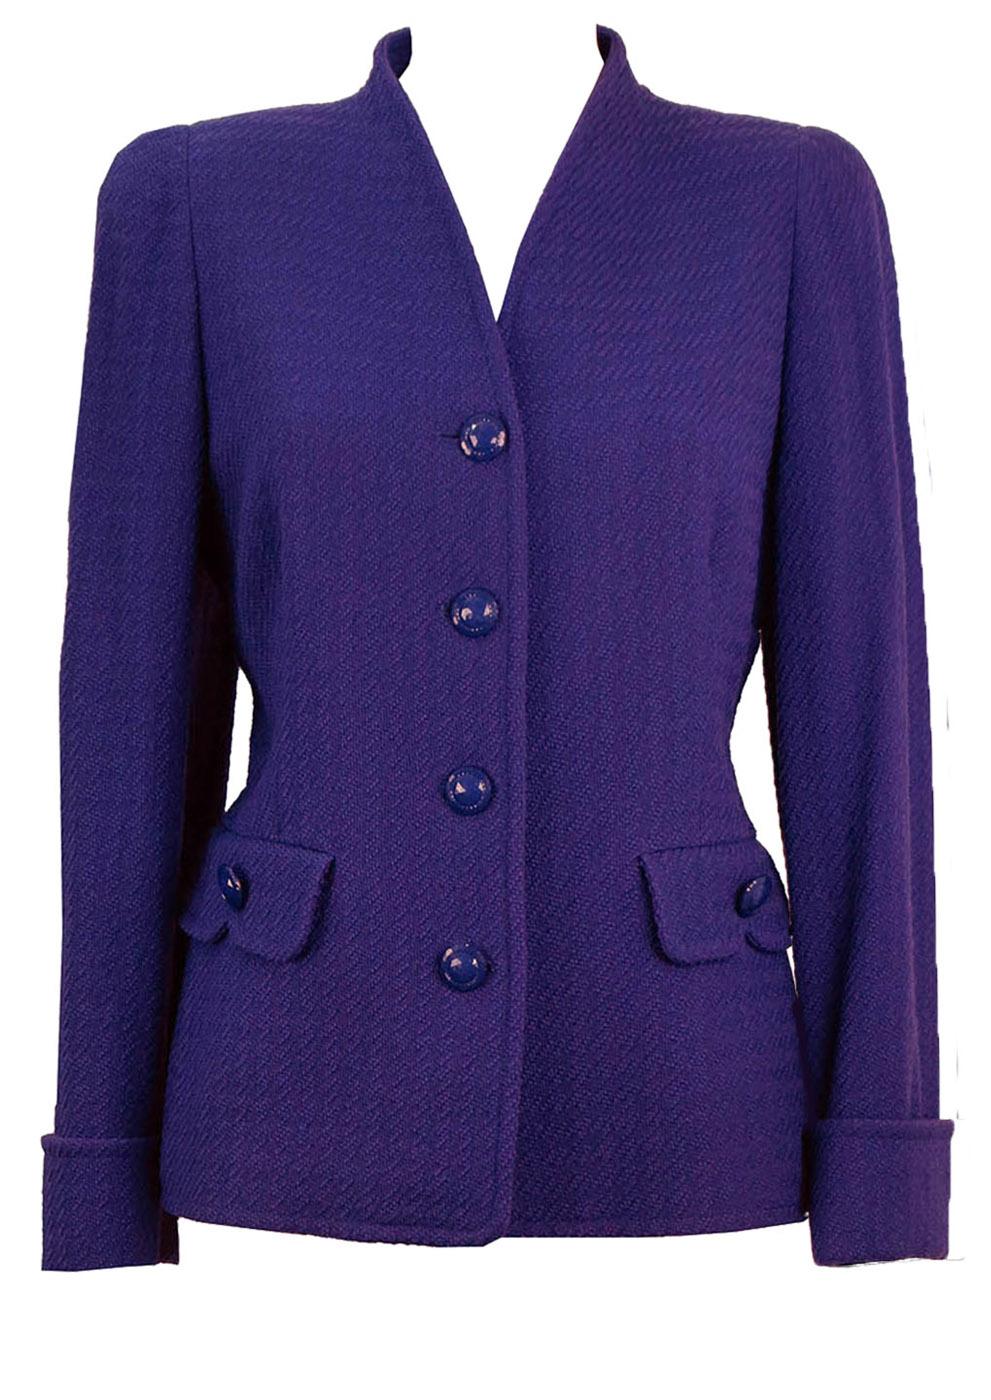 1100a3d6e66 Luisa Spagnoli Pure Wool Violet Jacket – M – Reign Vintage